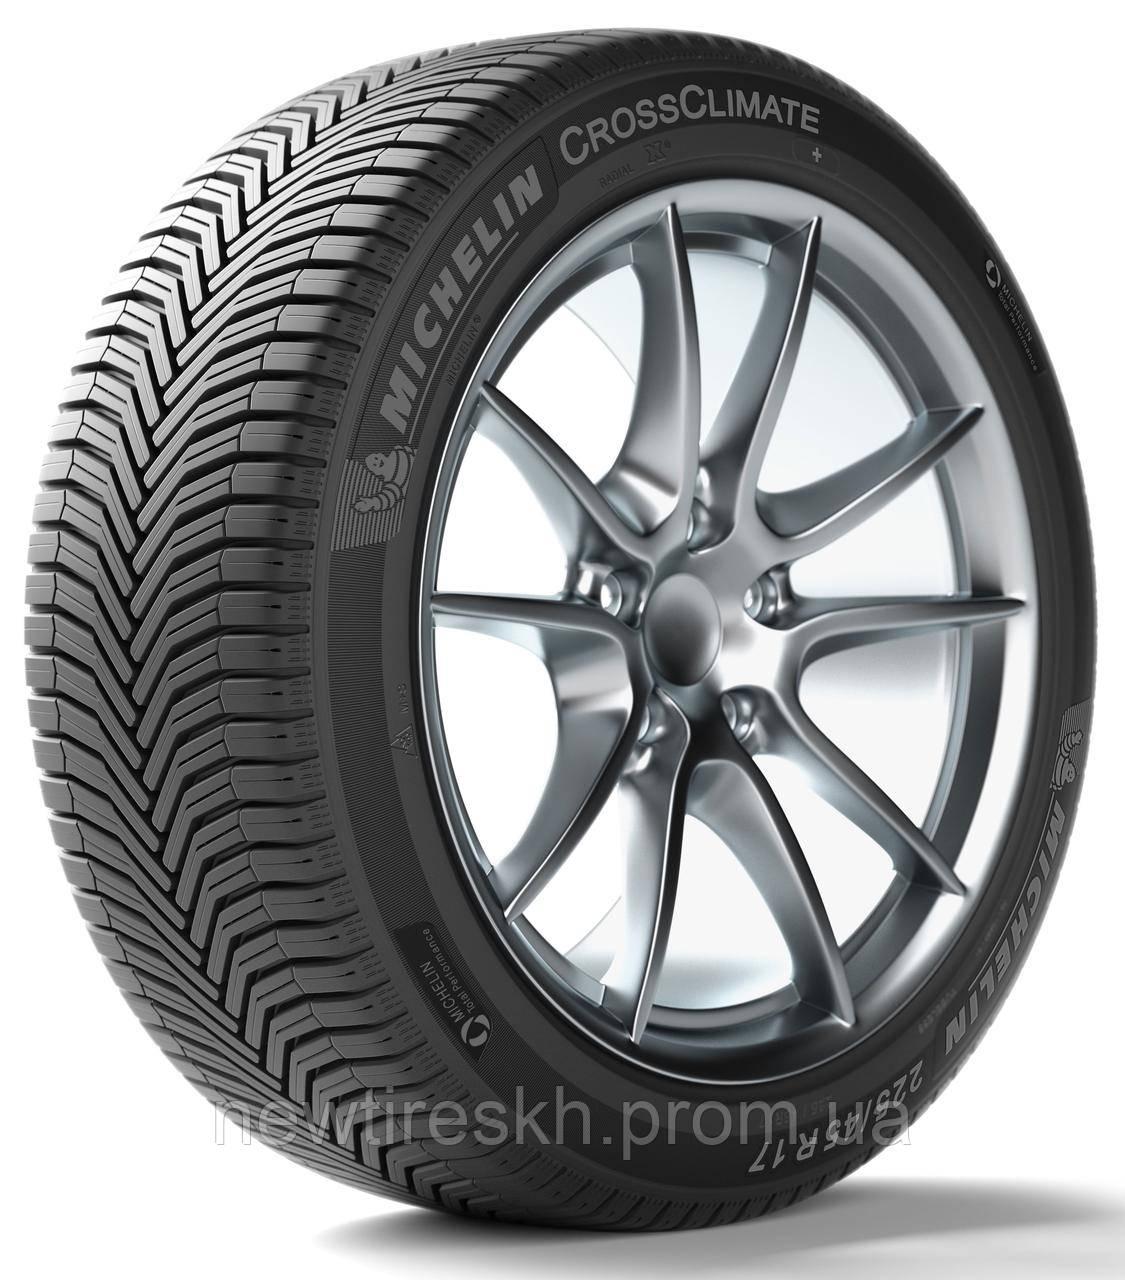 Michelin CrossClimate Plus 205/55 R16 91H